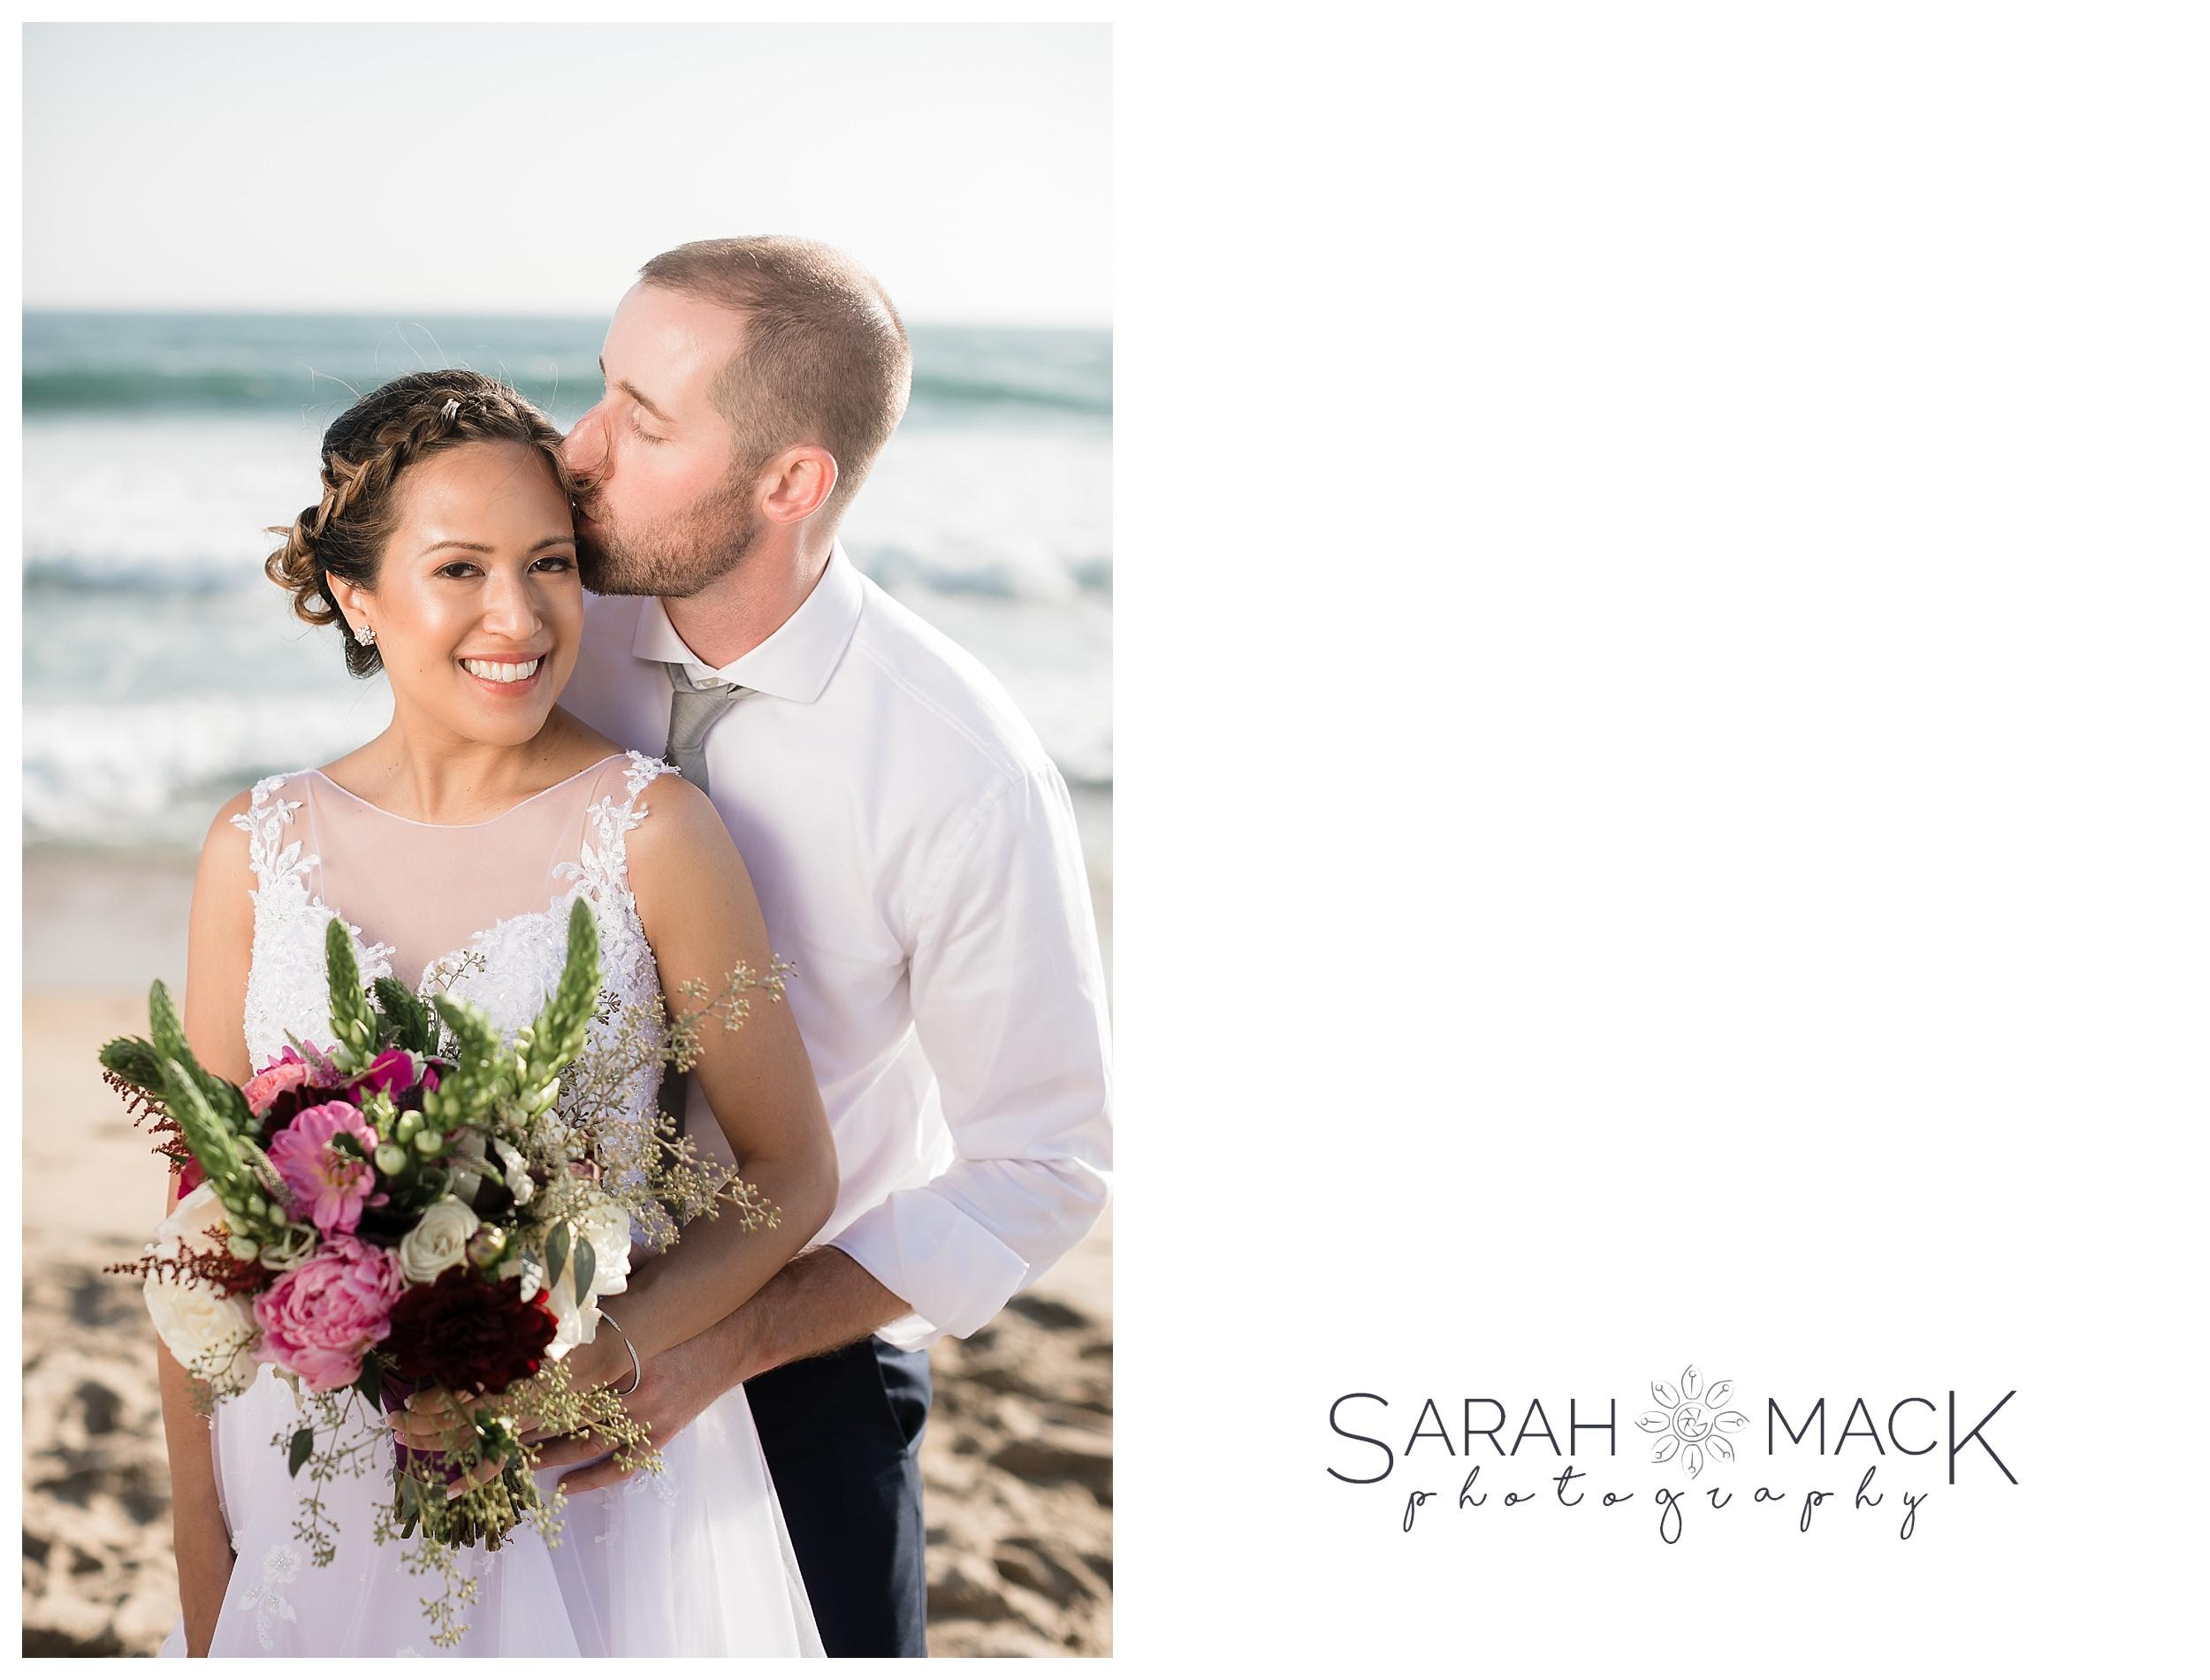 MR-Sea-Cliffe-Country-Club-Huntington-Beach-Wedding-0116-1.jpg